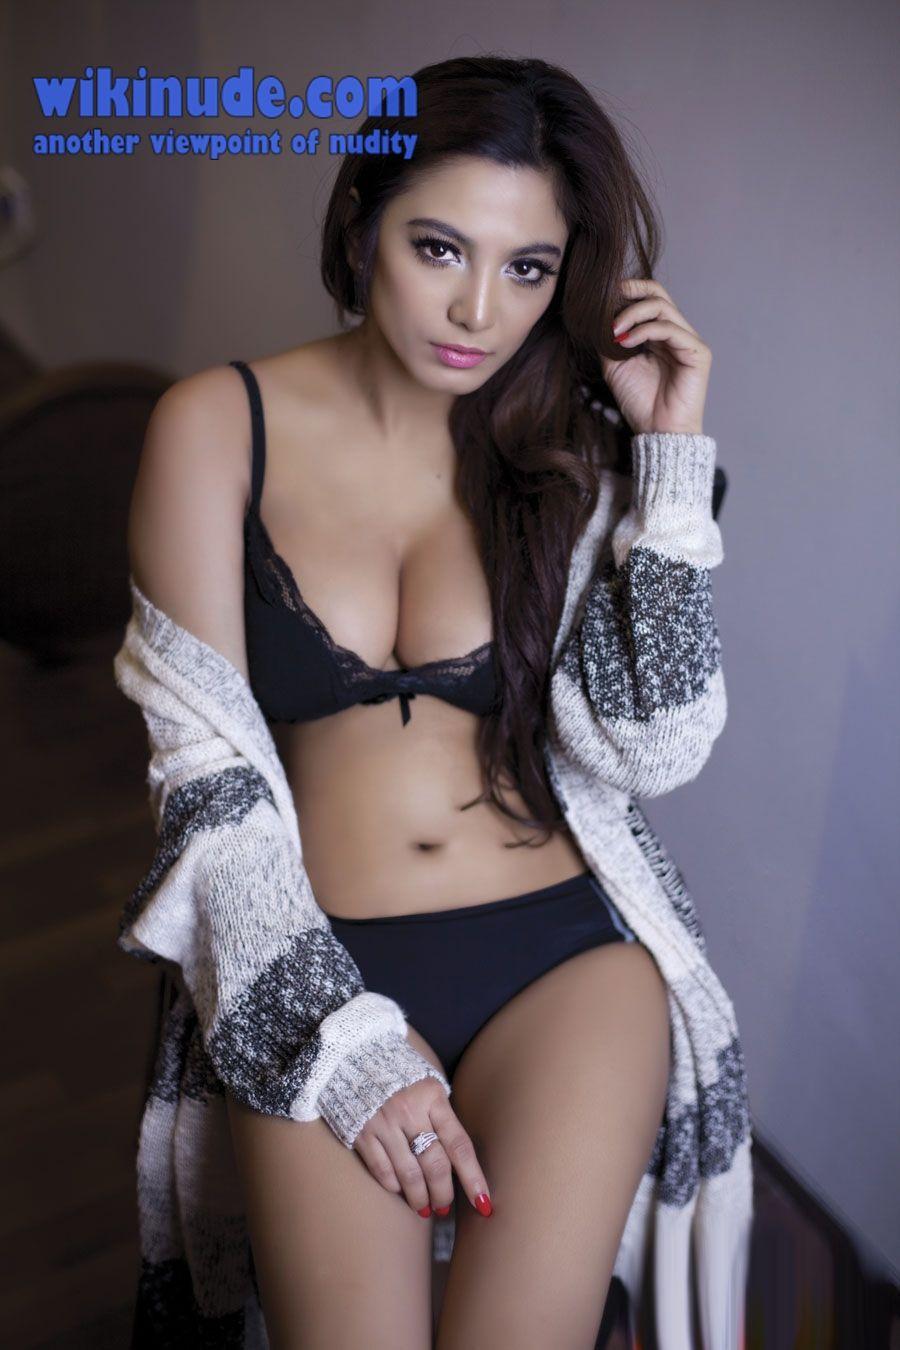 Indonesia porn model Sisi Salsabila Model Sexy Maxim Indonesia Februari 2014 Christania  Nayla,Popular World Sisi Salsabila Model Sexy Maxim Indonesia Februari